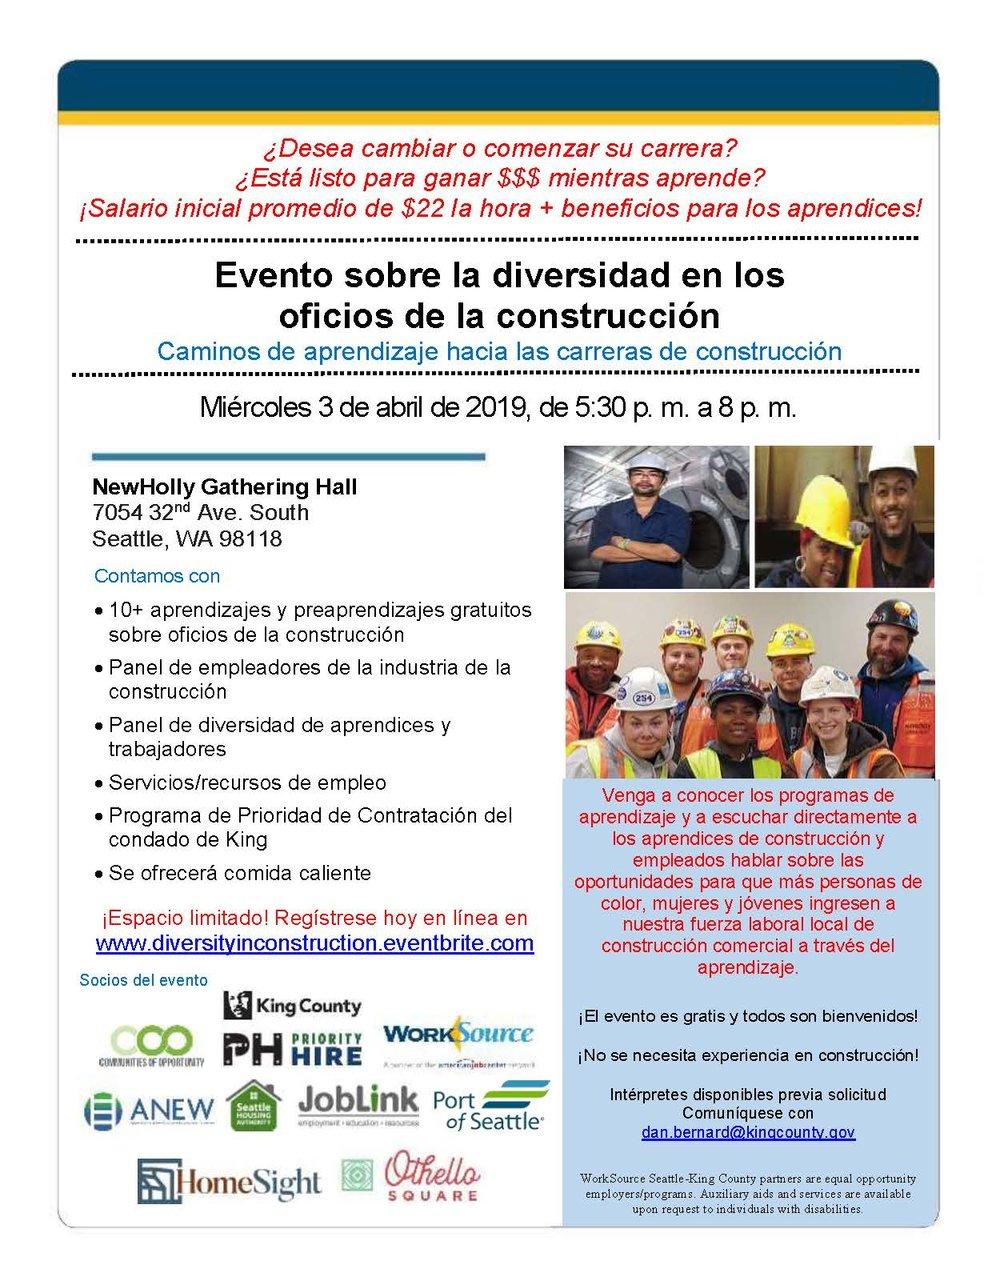 4-3-19 Diversity in Construction  Trades Apprenticeships event  Spanish.jpg